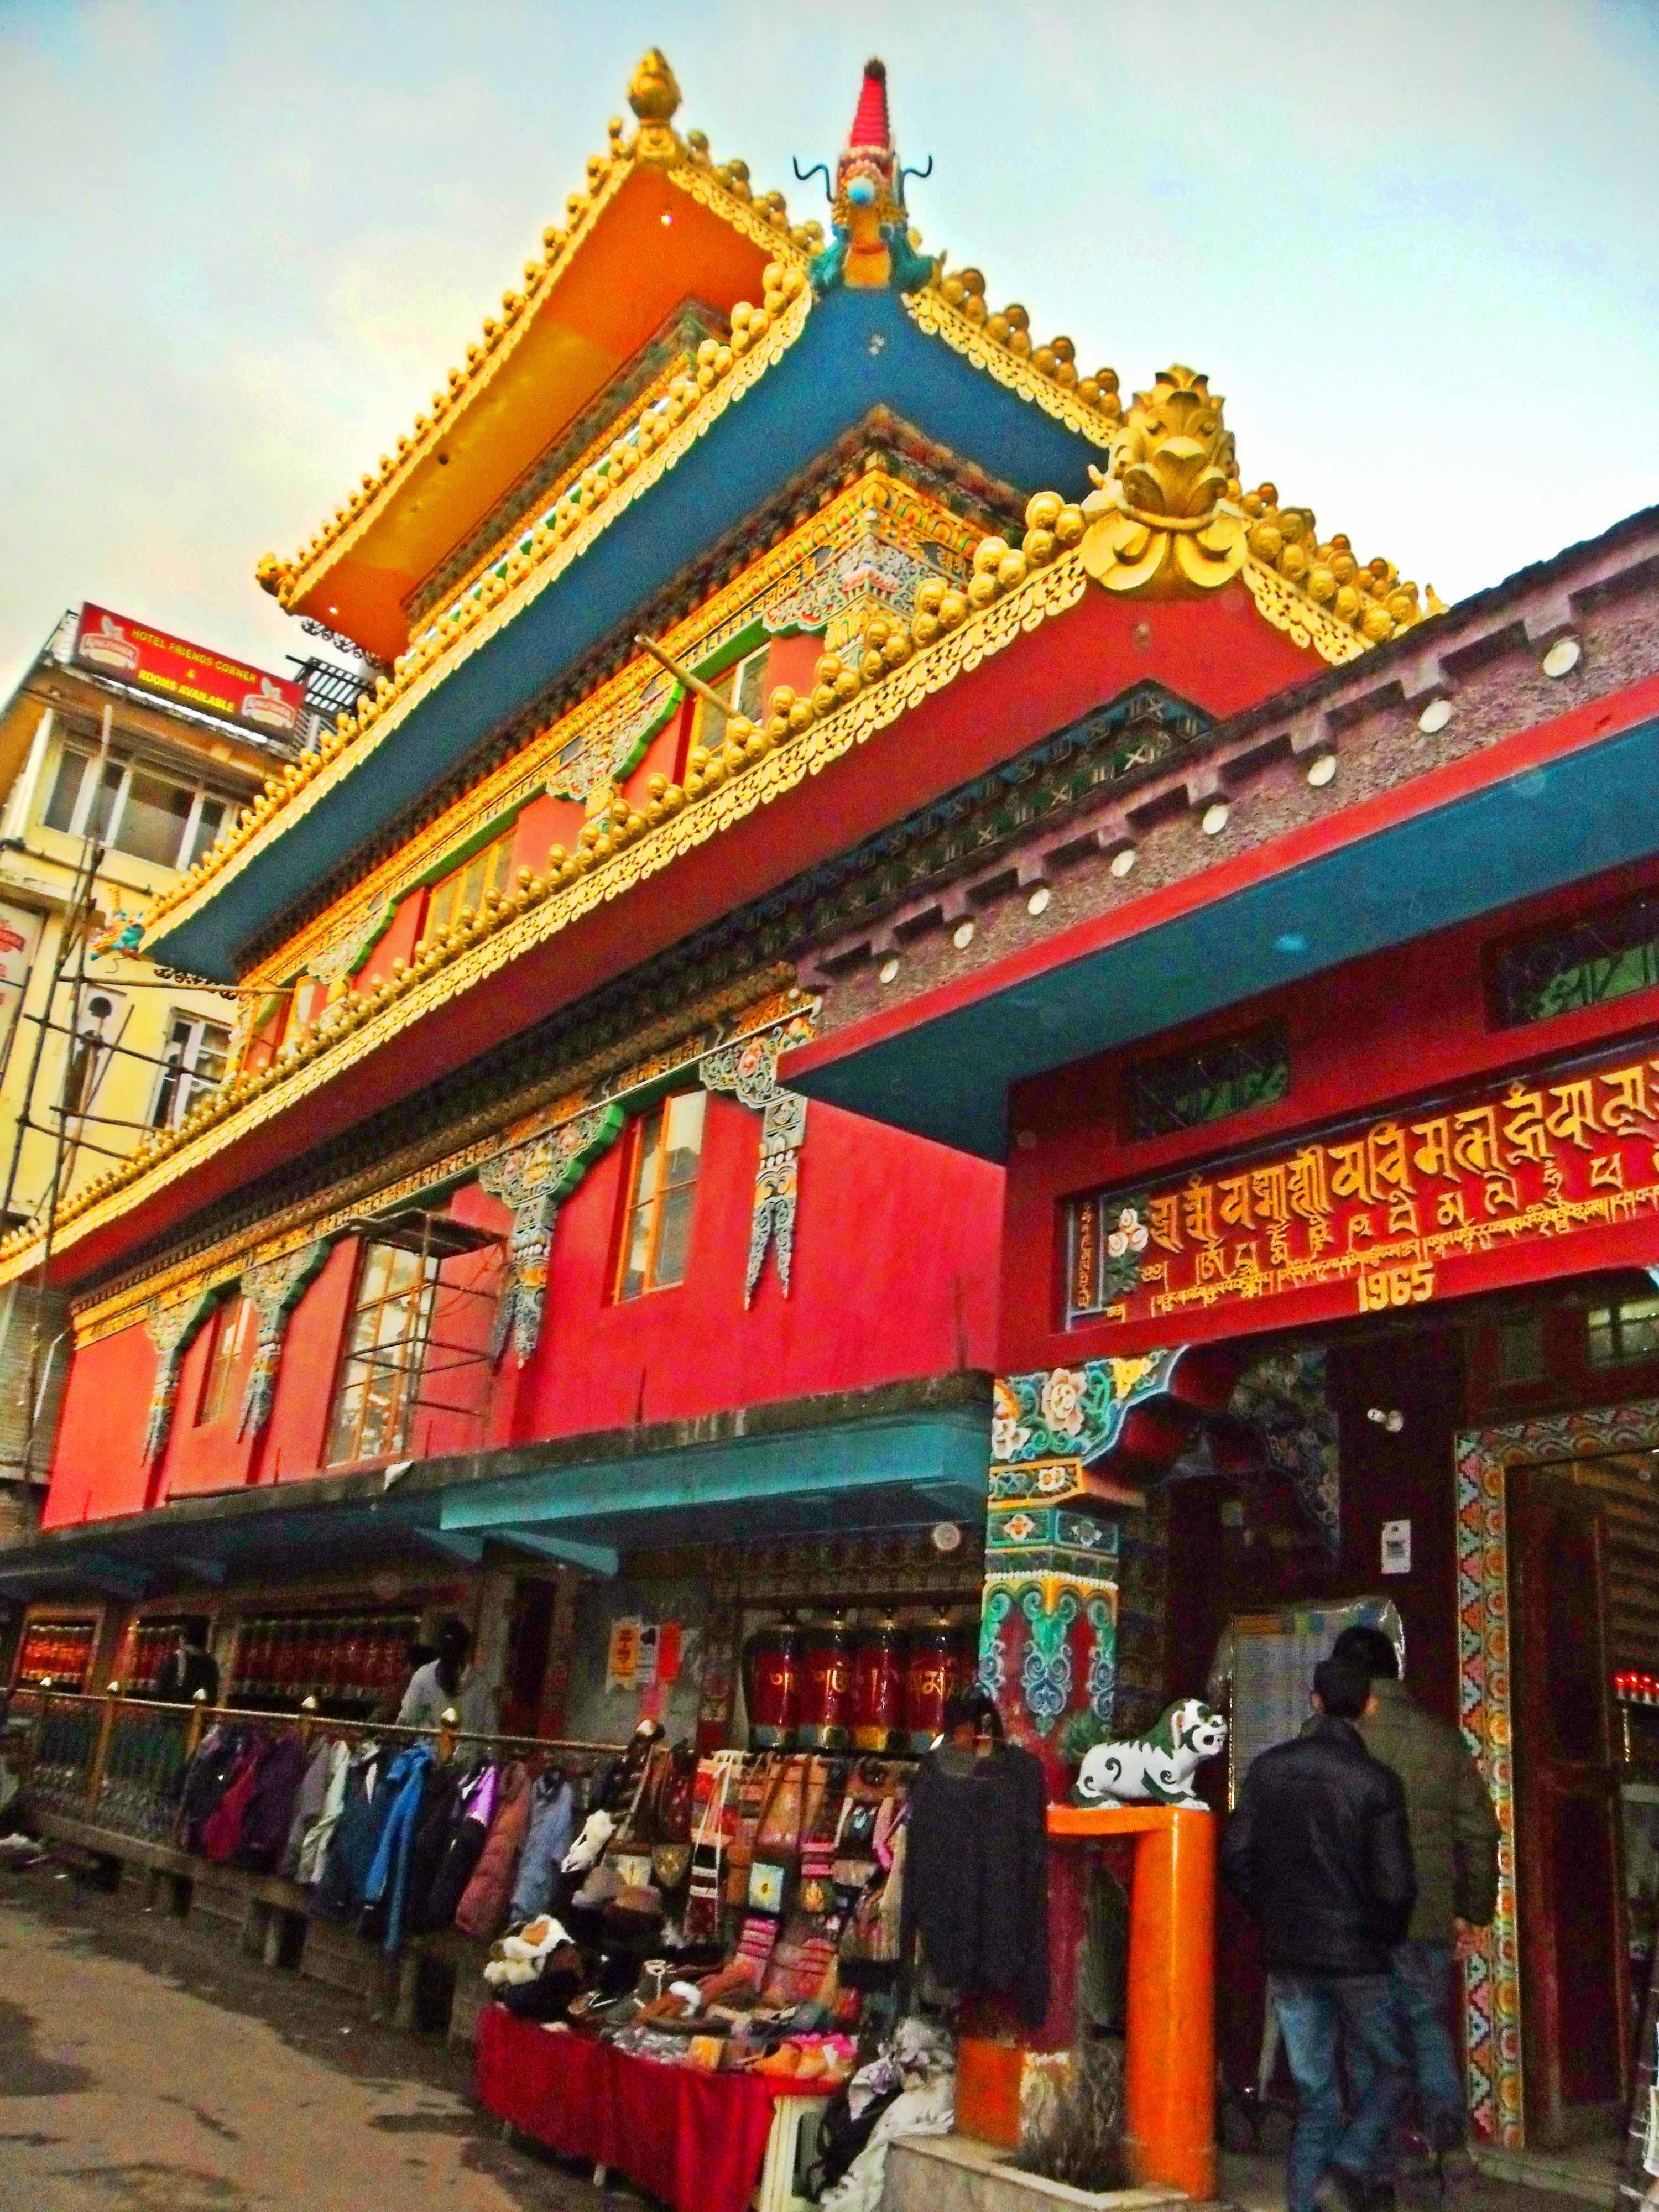 Kalachakra Temple